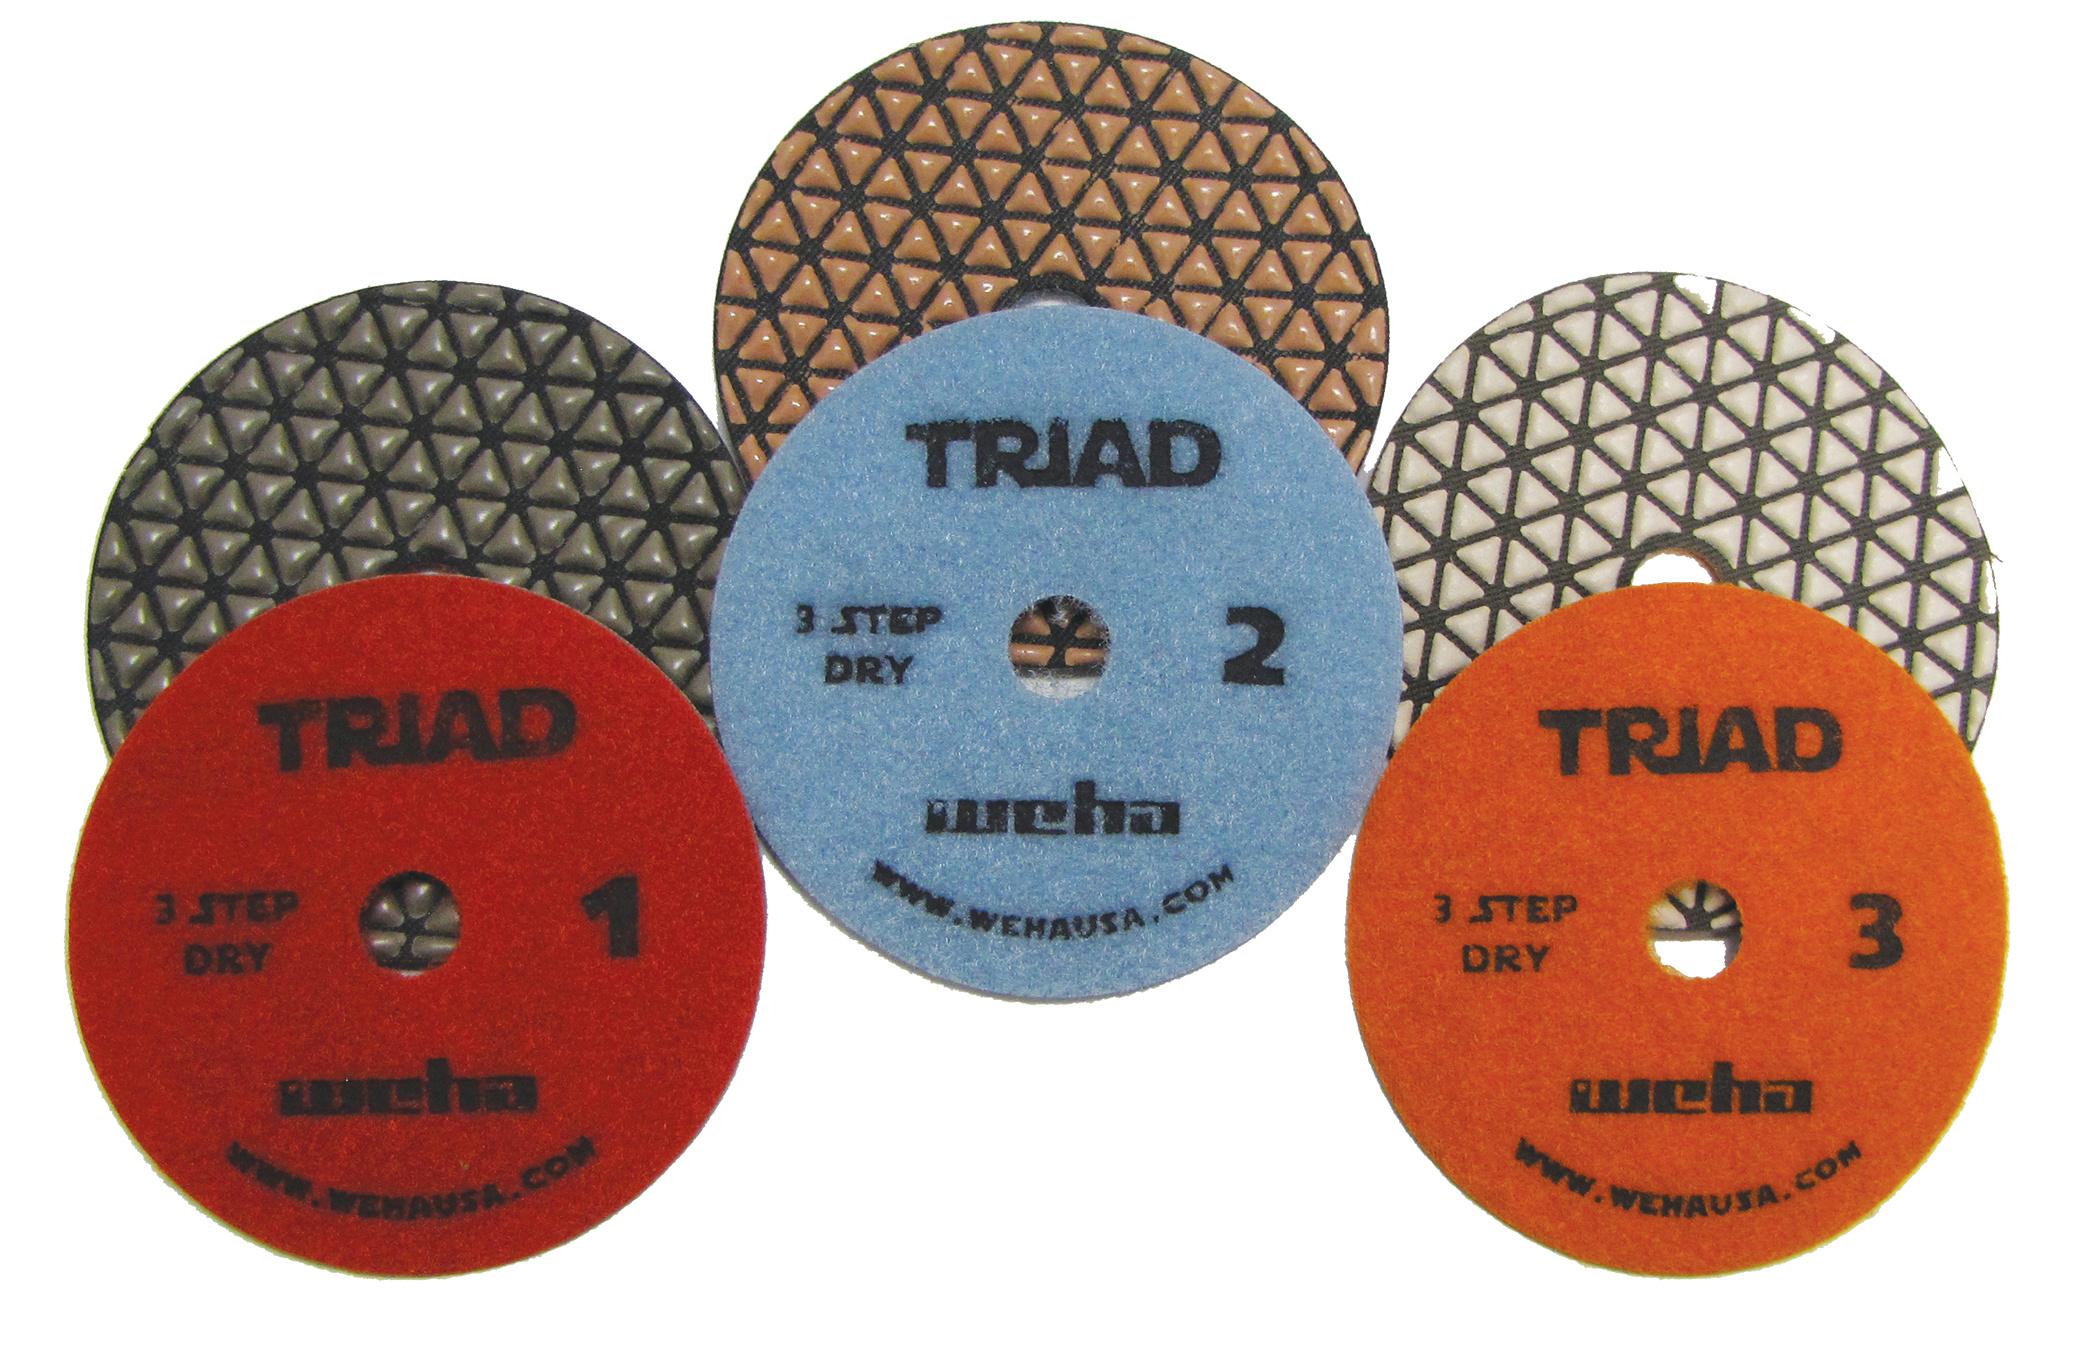 Triad 3 Step Pads Group